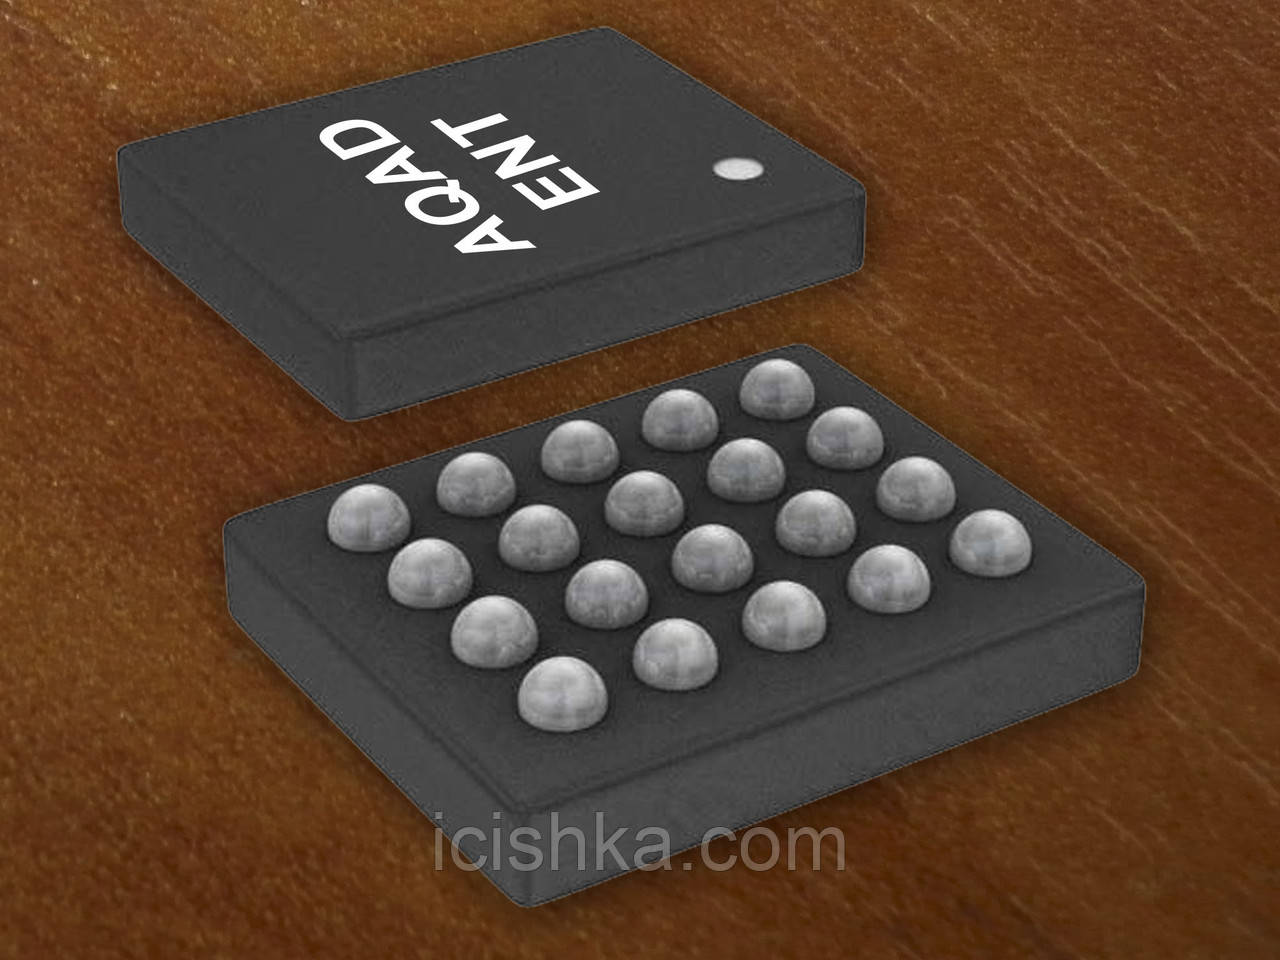 FAN5405UCX / FAN5405 [AQxx] WLCSP-20 - Контроллер зарядки и OTG